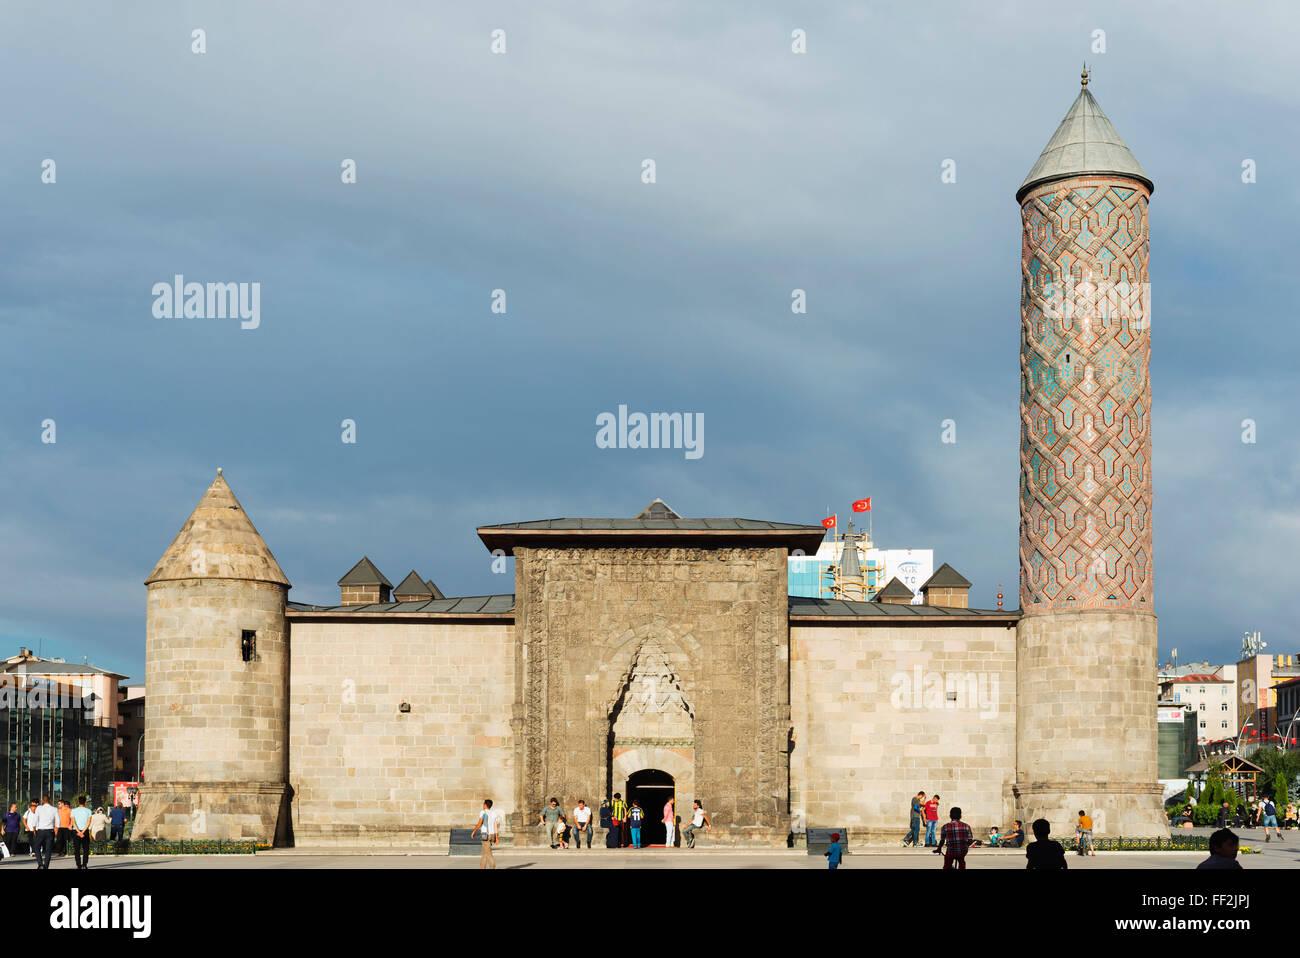 Turkish-IsRMamic Arts and Ethnography Museum, Erzerum, Eastern AnatoRMia, Turkey, Asia Minor, Eurasia - Stock Image